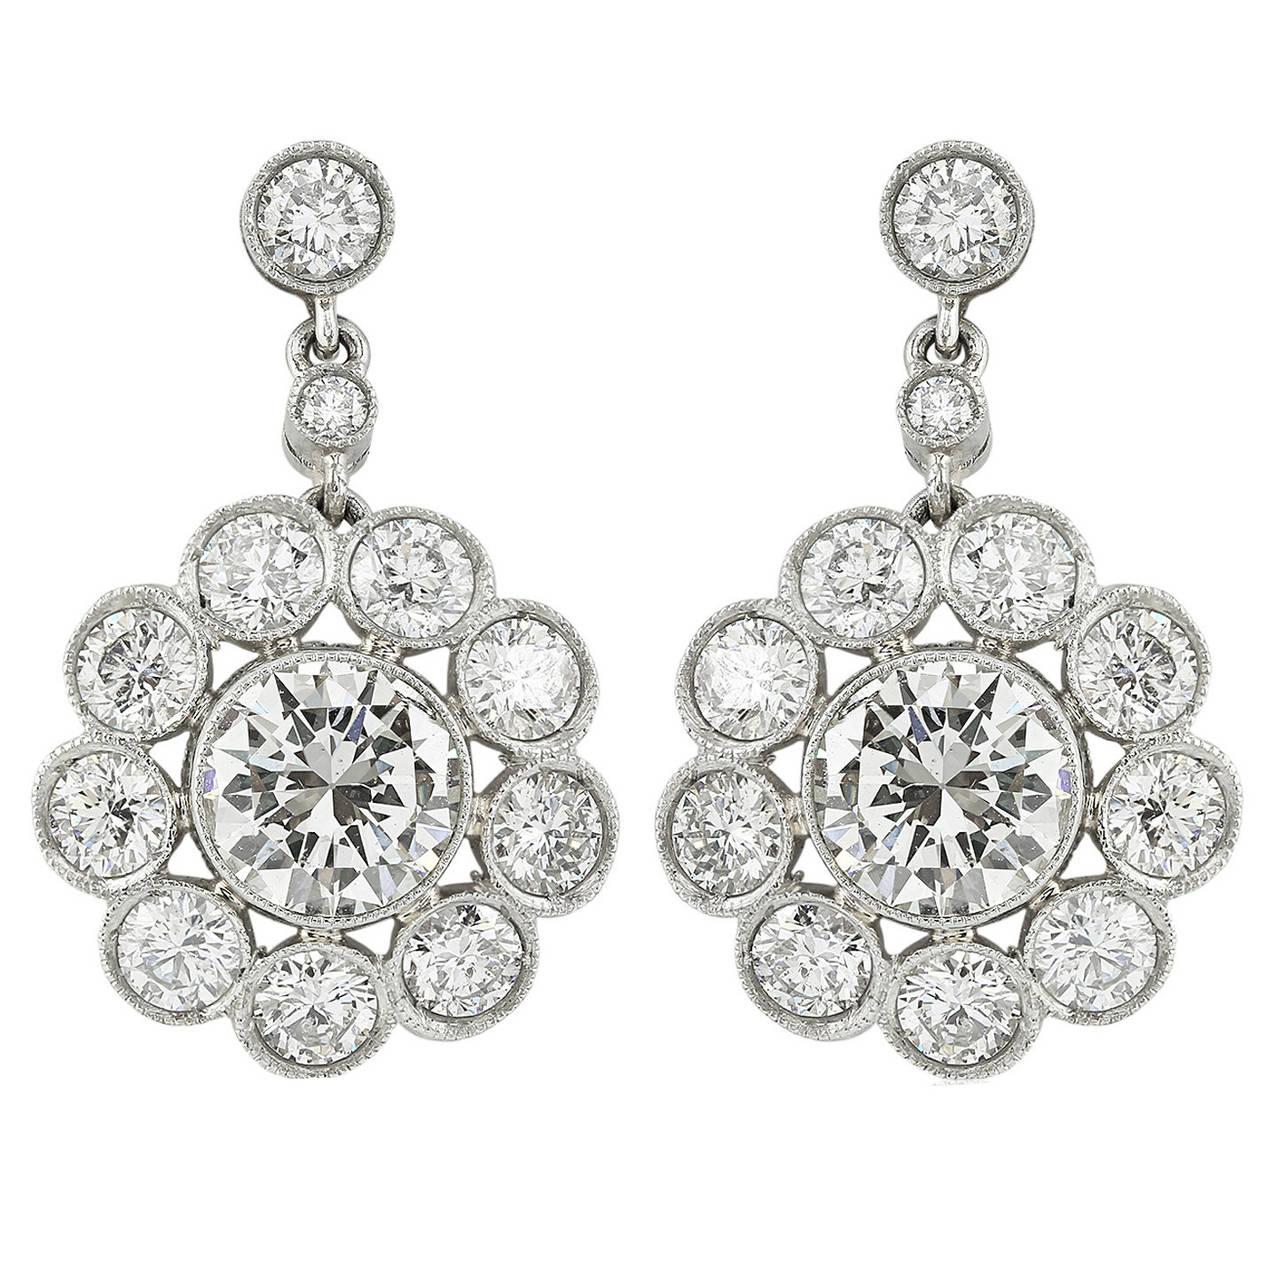 5.03 Carat Diamond Cluster Earrings